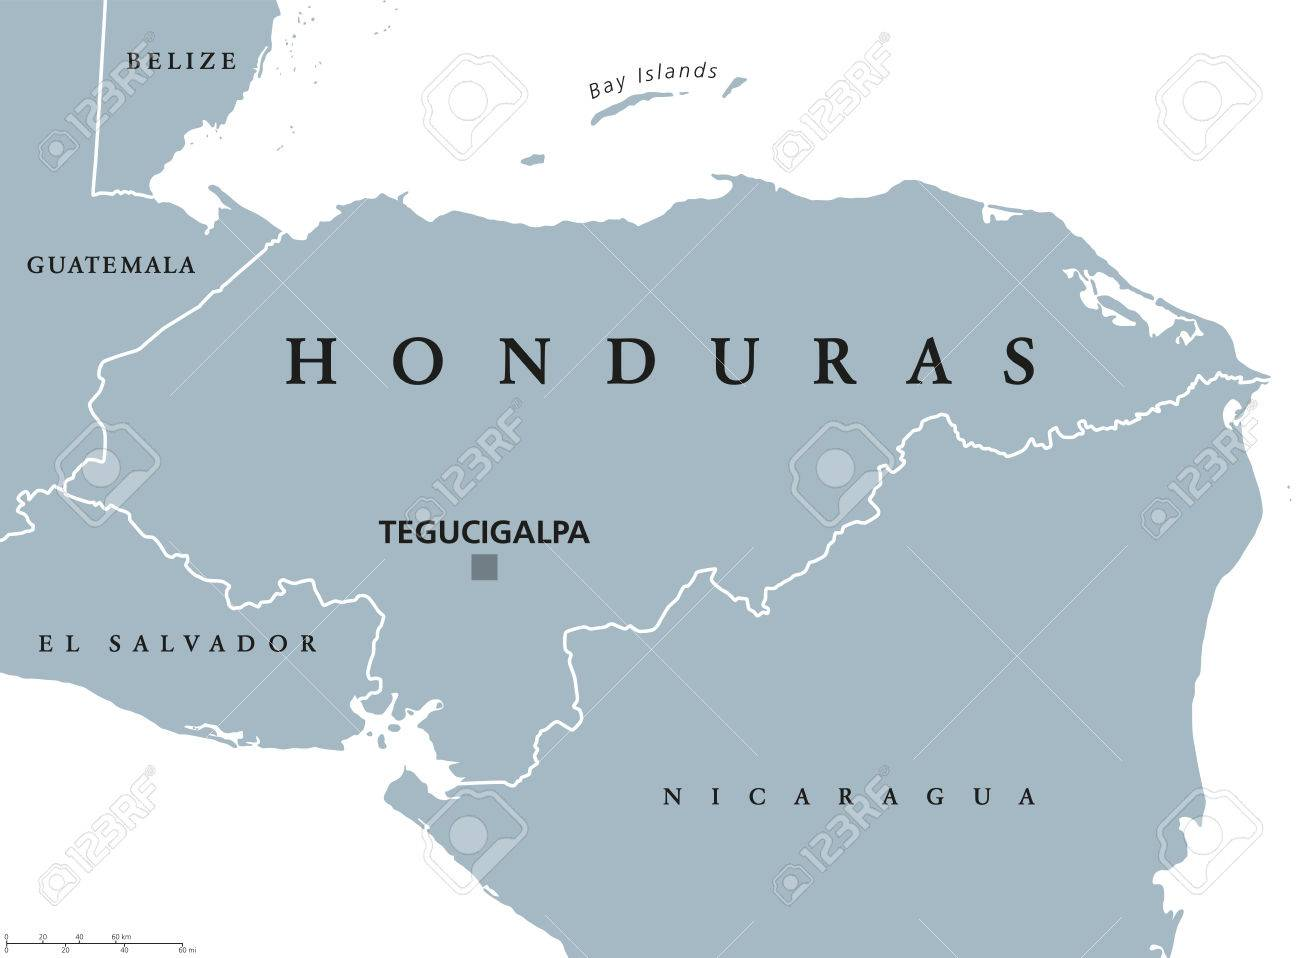 Honduras political map with capital Tegucigalpa, national borders..